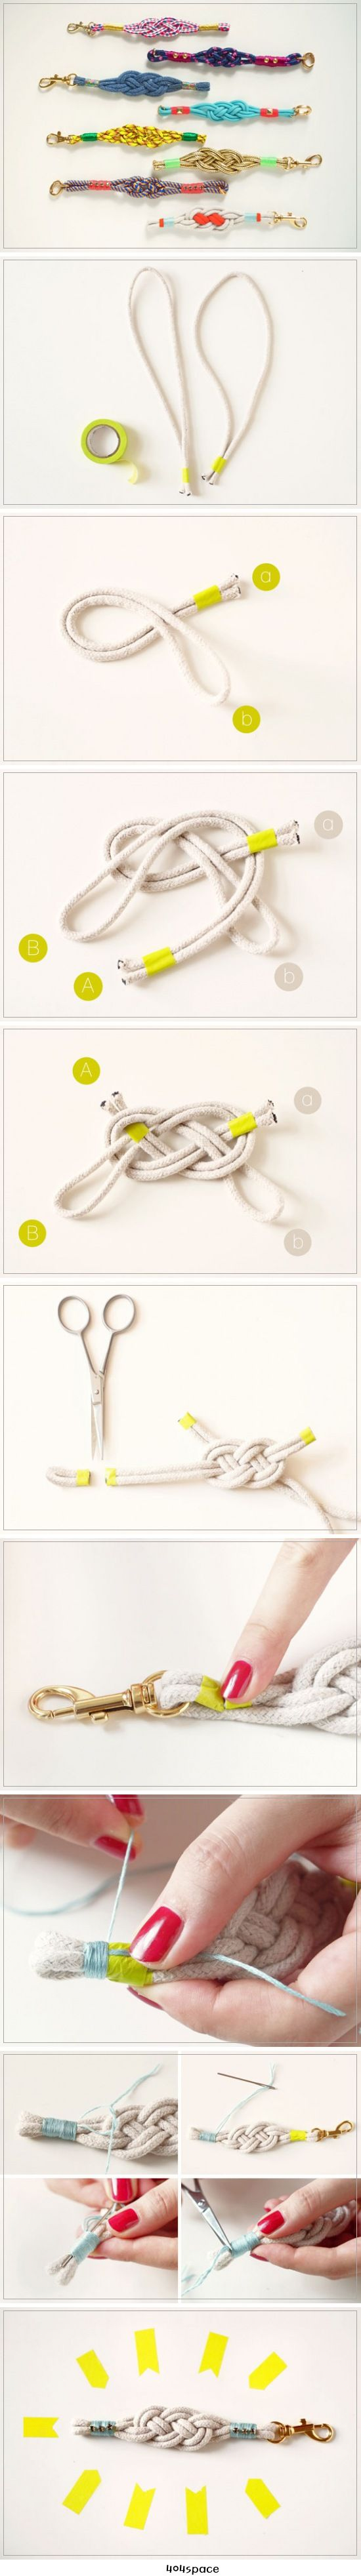 How-Tuesday: Nautical Knot Bracelets  열쇠고리 만들기 DIY